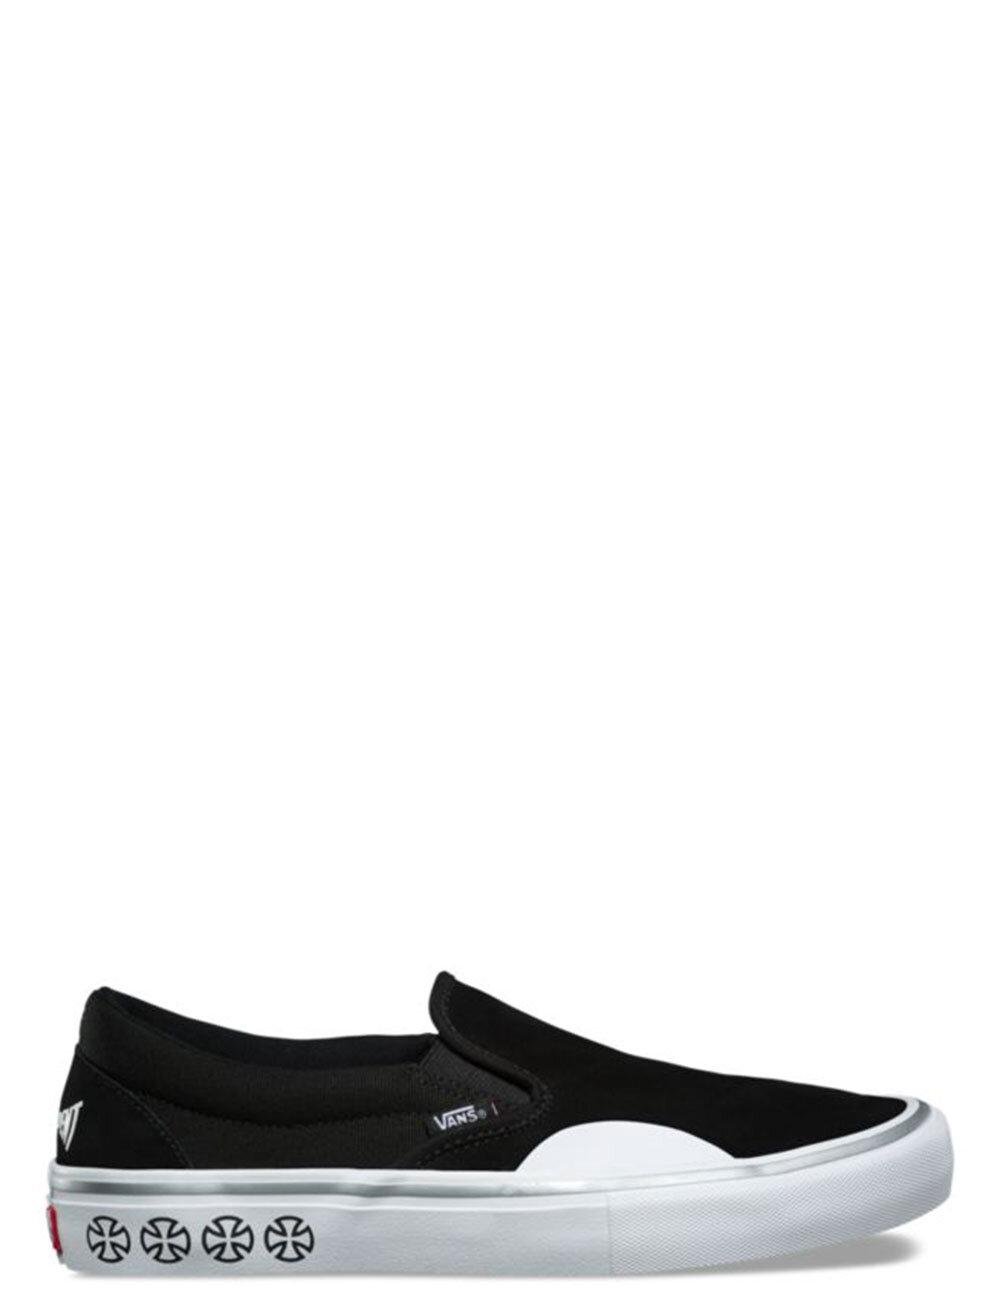 0a7f95e959 SLIP ON PRO - INDEPENDENT - Men s Footwear